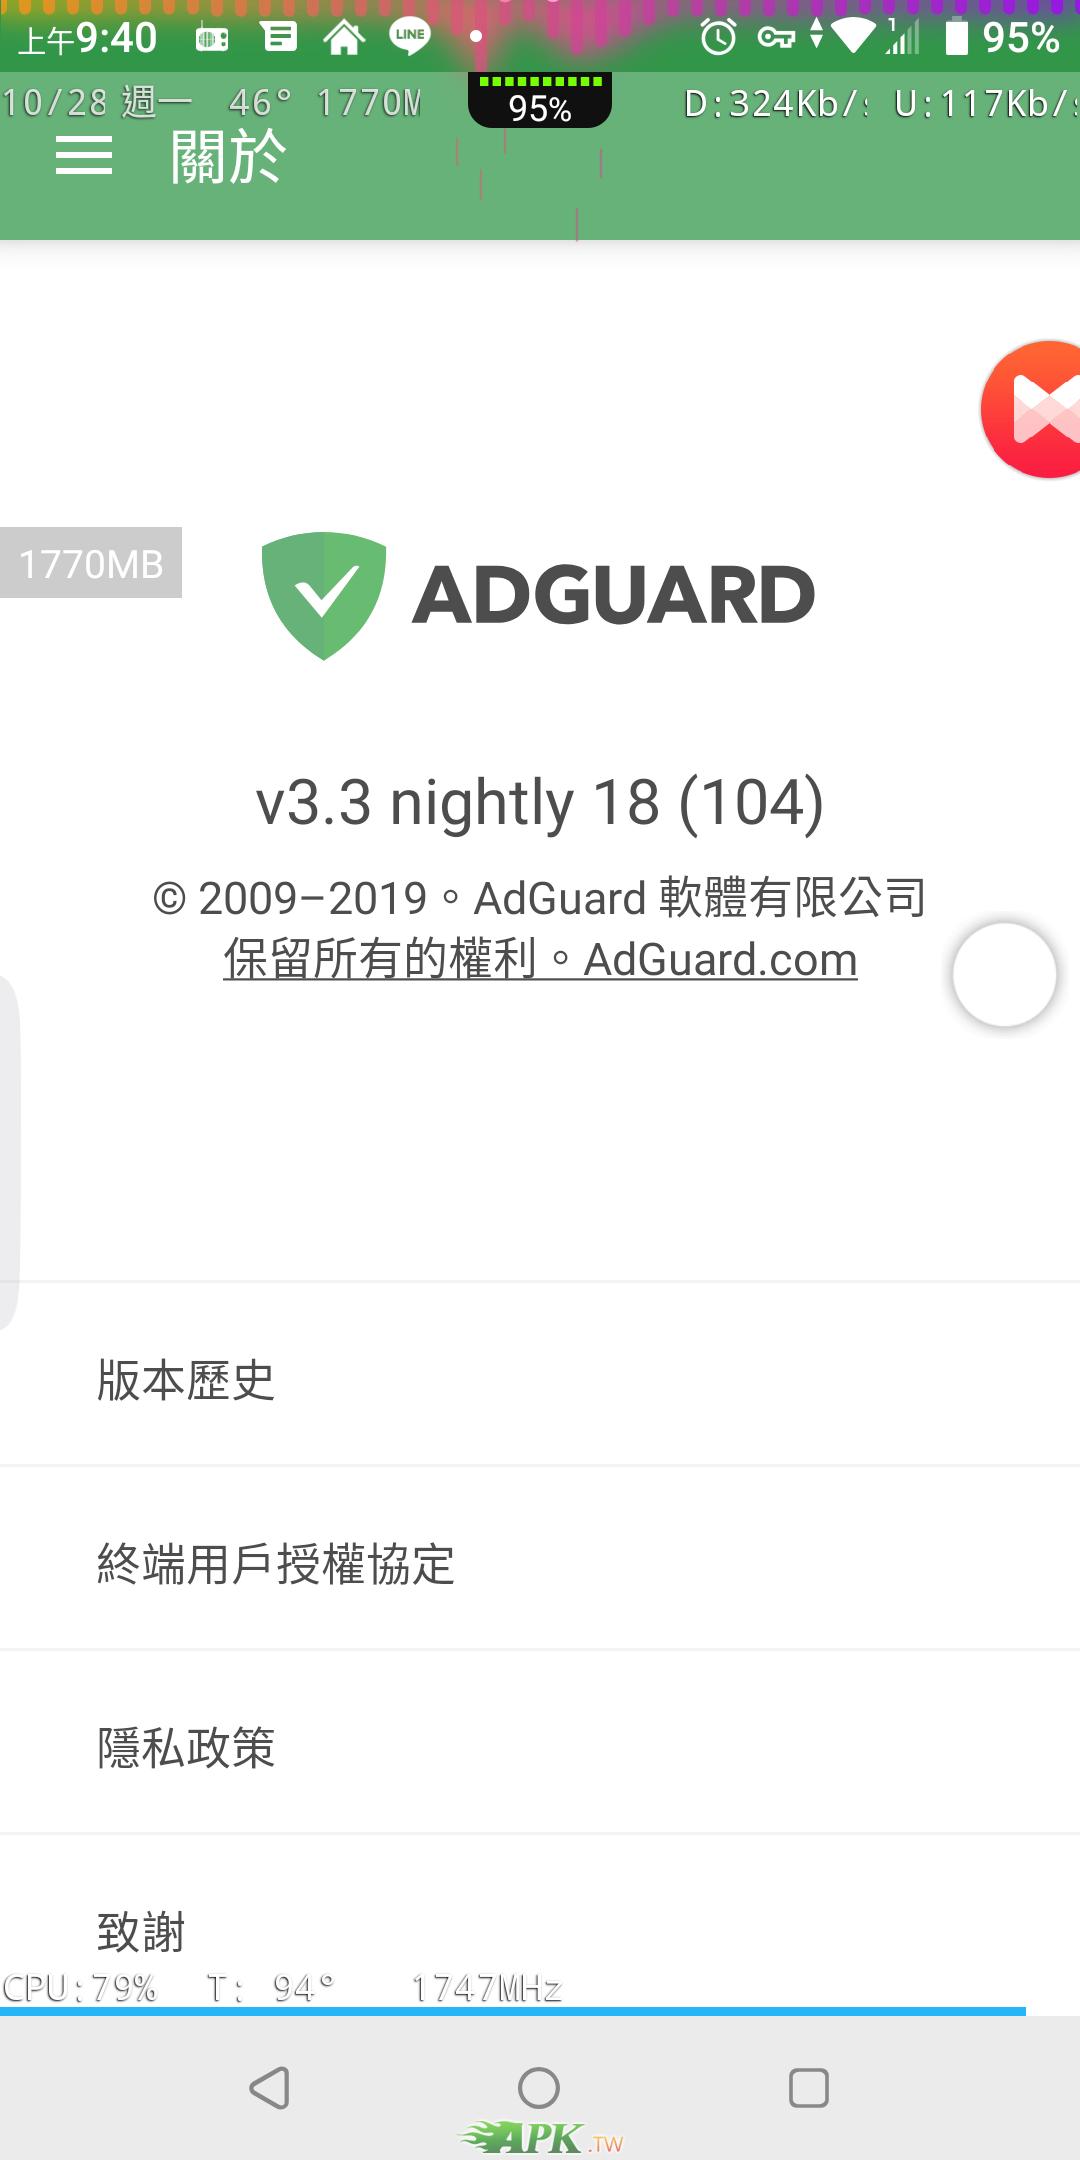 Screenshot_20191028-094033.png